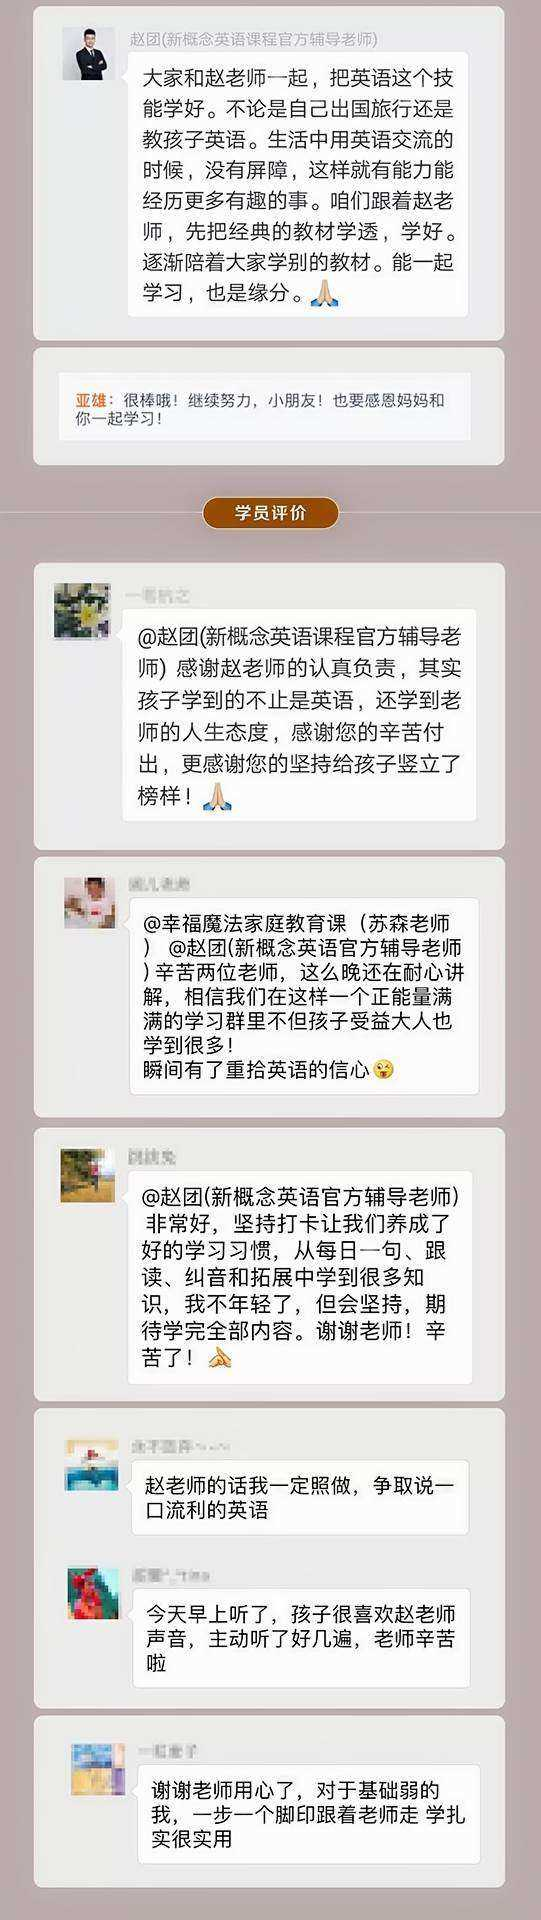 http://www.huodongxing.com/file/20160530/5092341960349/693248896746359.jpg